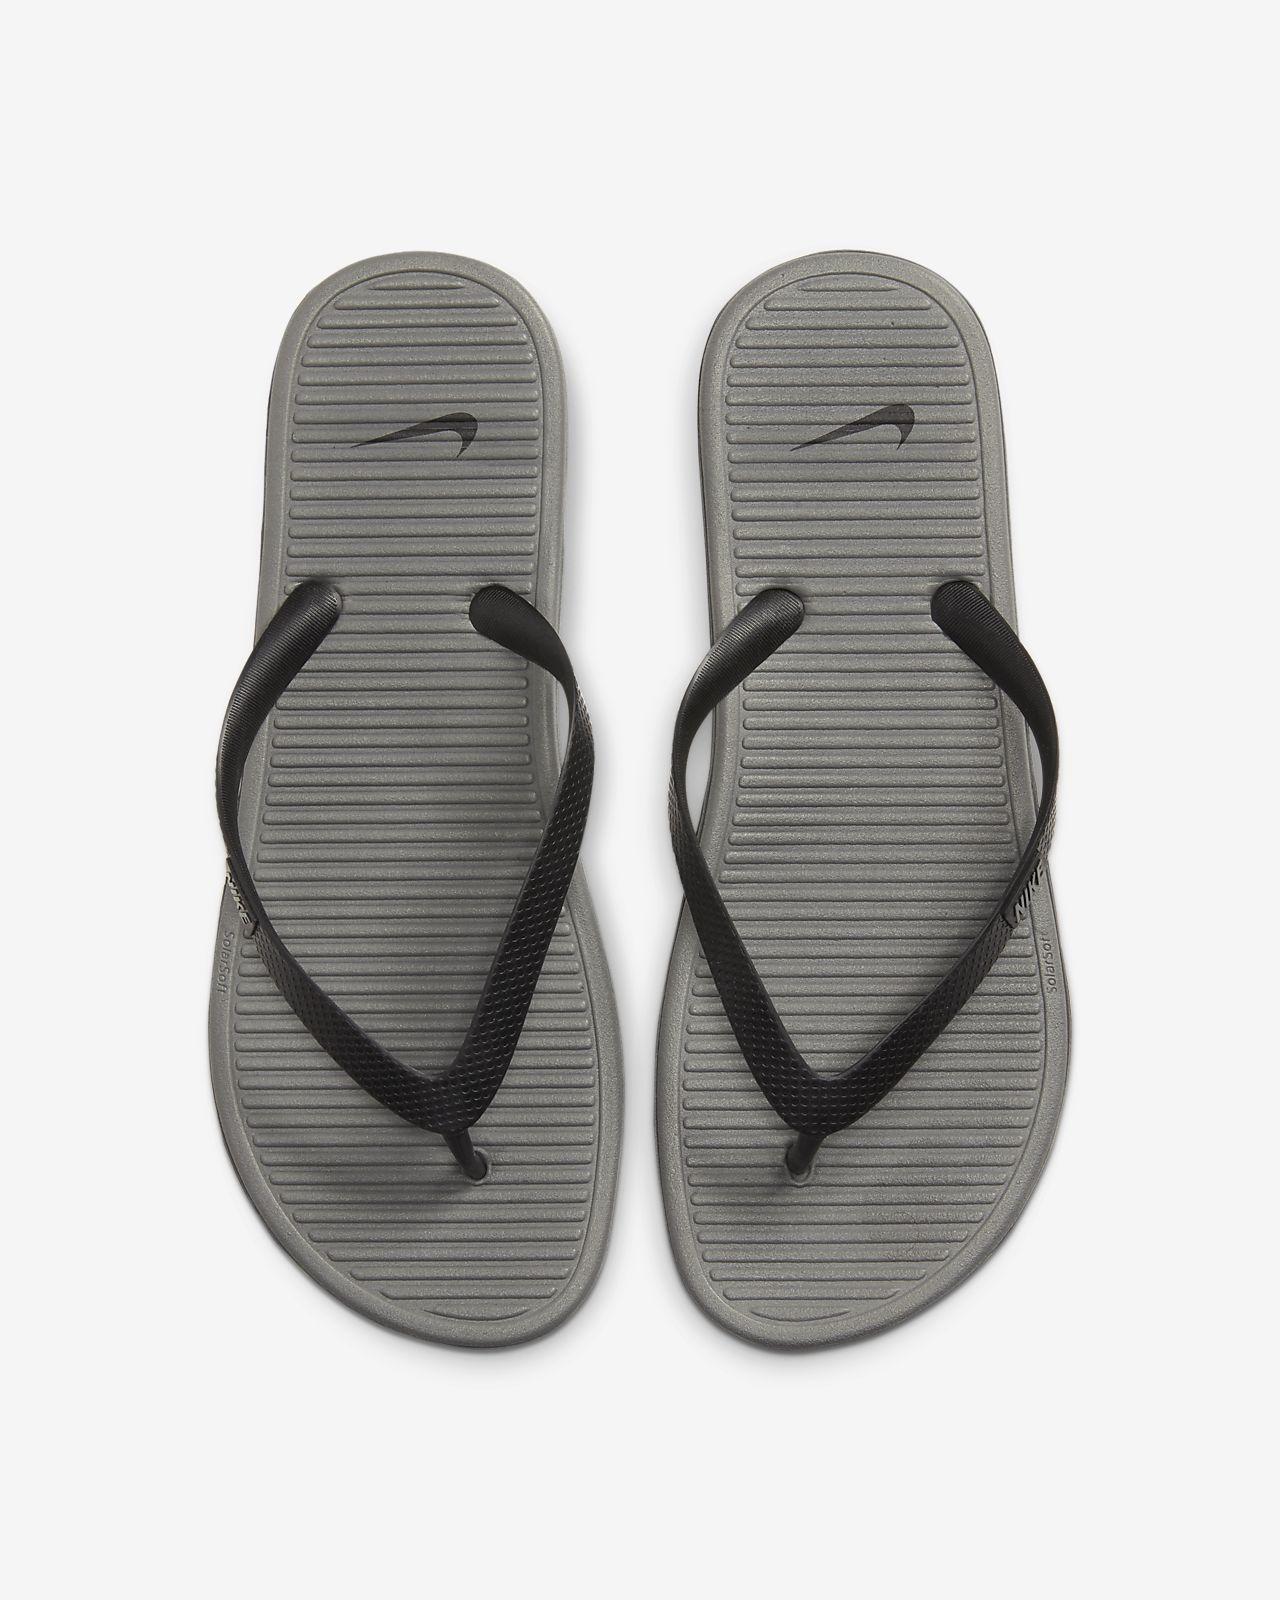 d0eefd11e07431 Nike Solarsoft II Men s Flip Flop. Nike.com LU